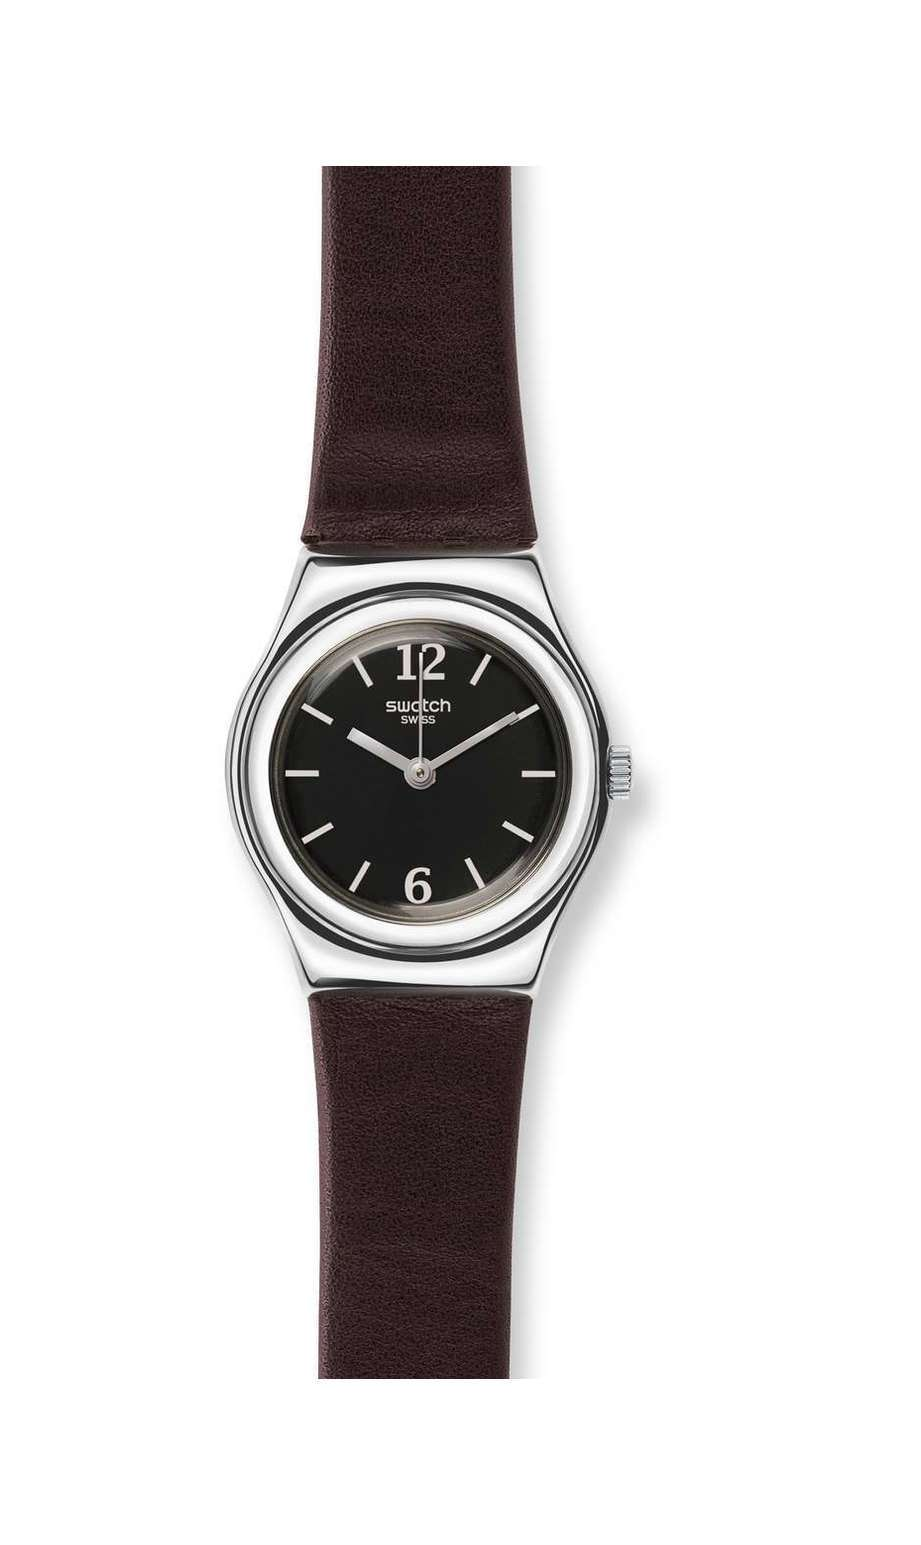 Swatch - HUMP - 1